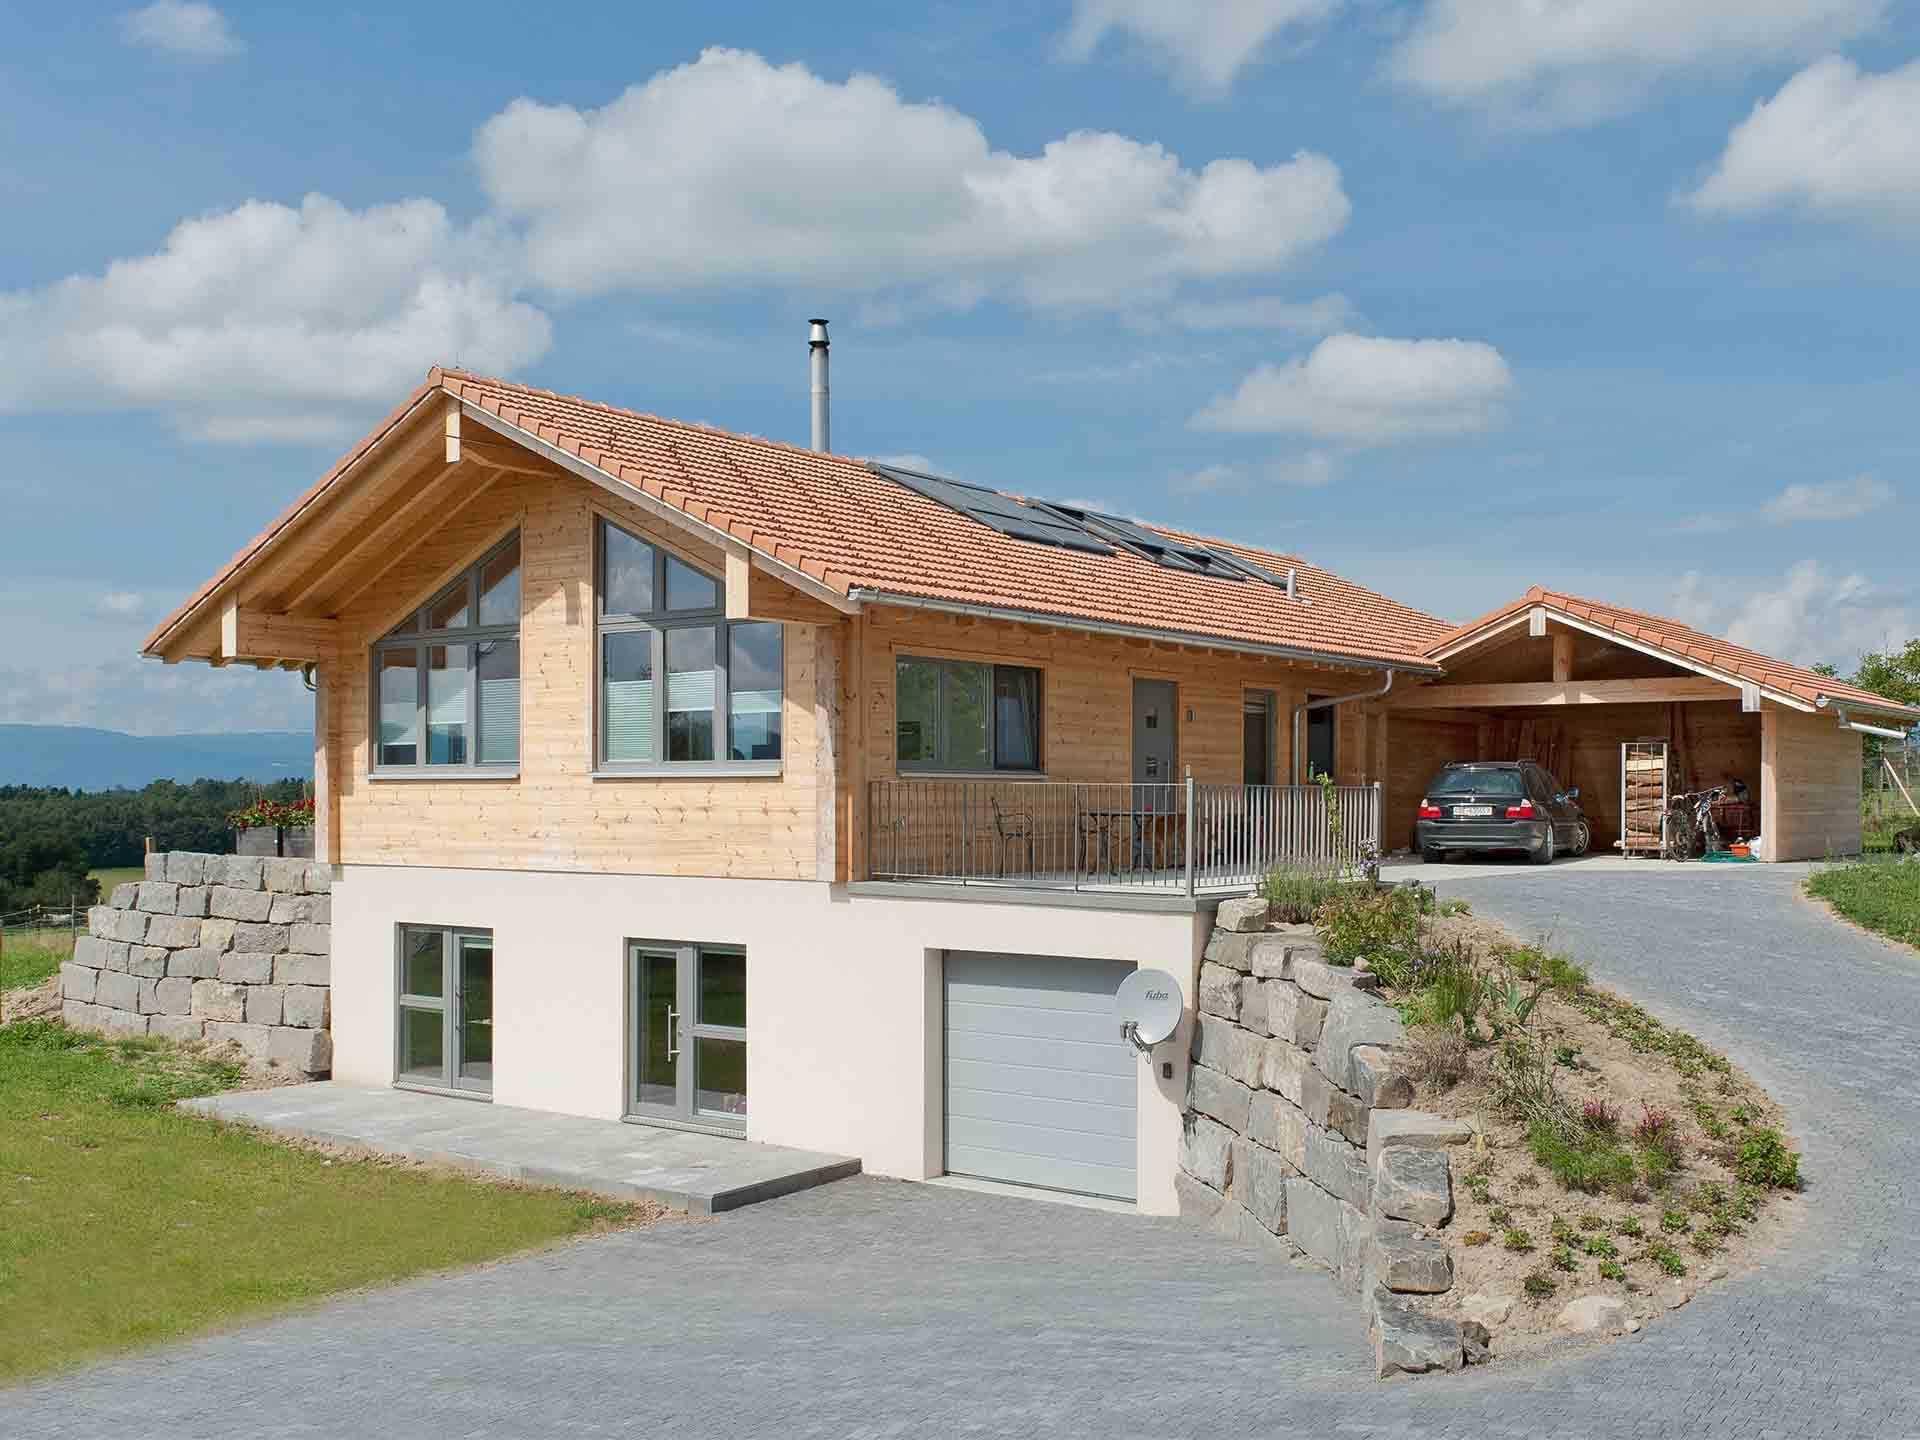 Musterhaus Sunnsite Fullwood Wohnblockhaus in 2020